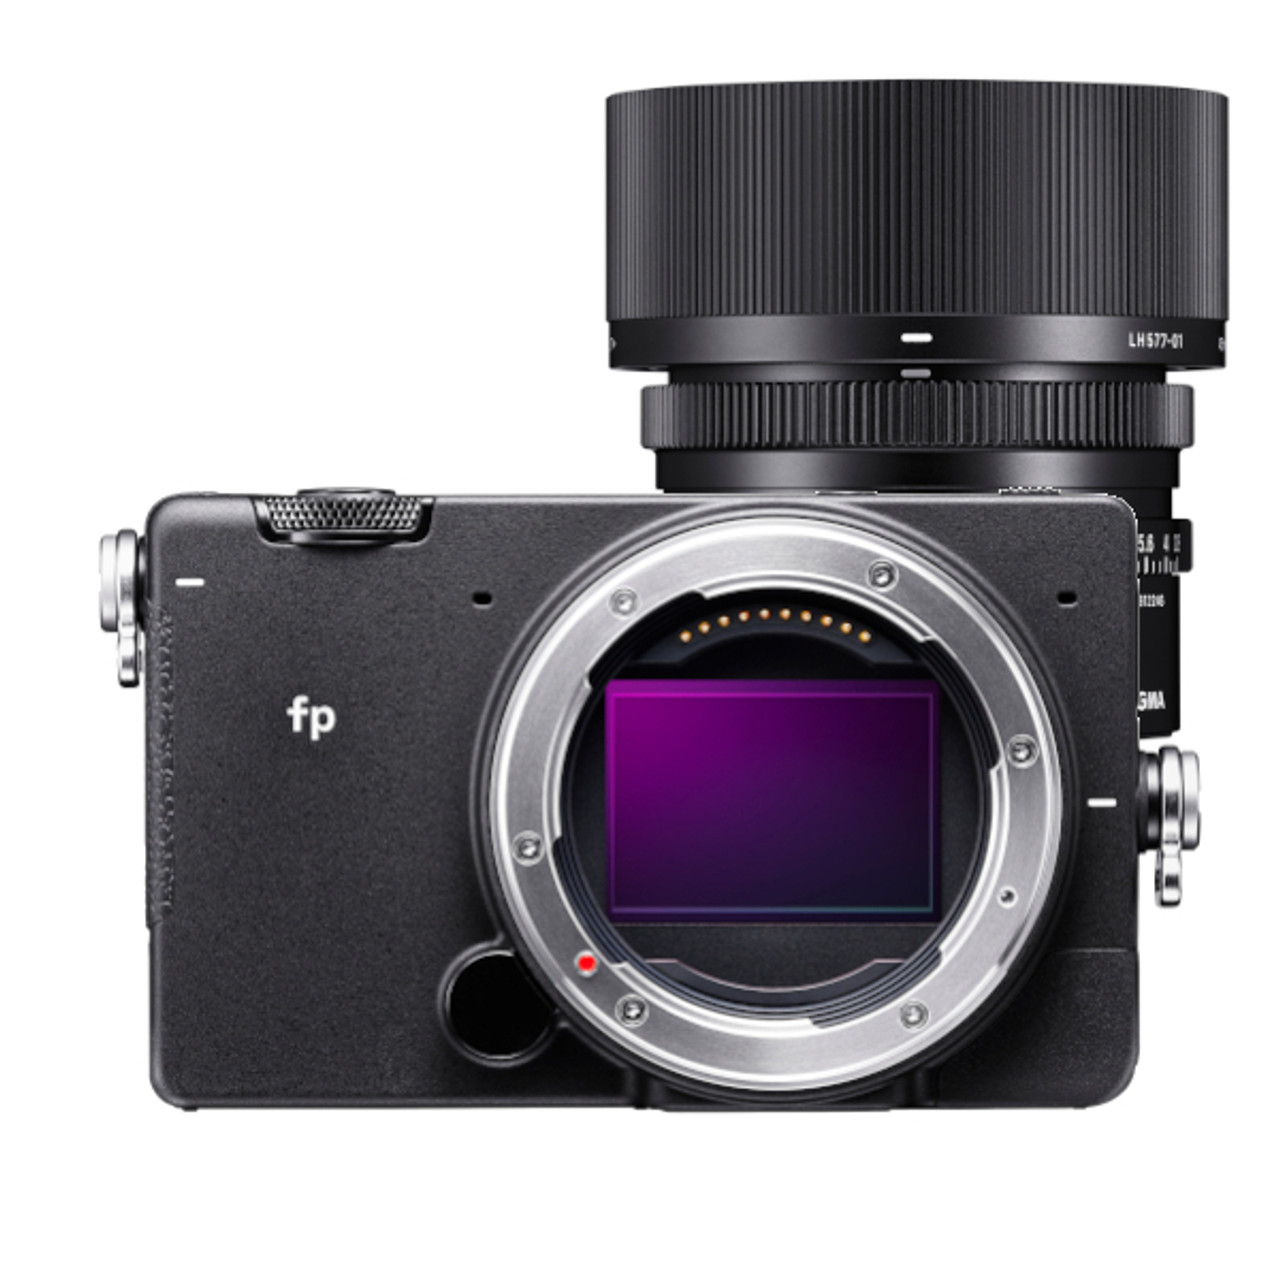 Sigma fp w/ Contemporary 45mm F2.8 DG DN (Demo-Like New)